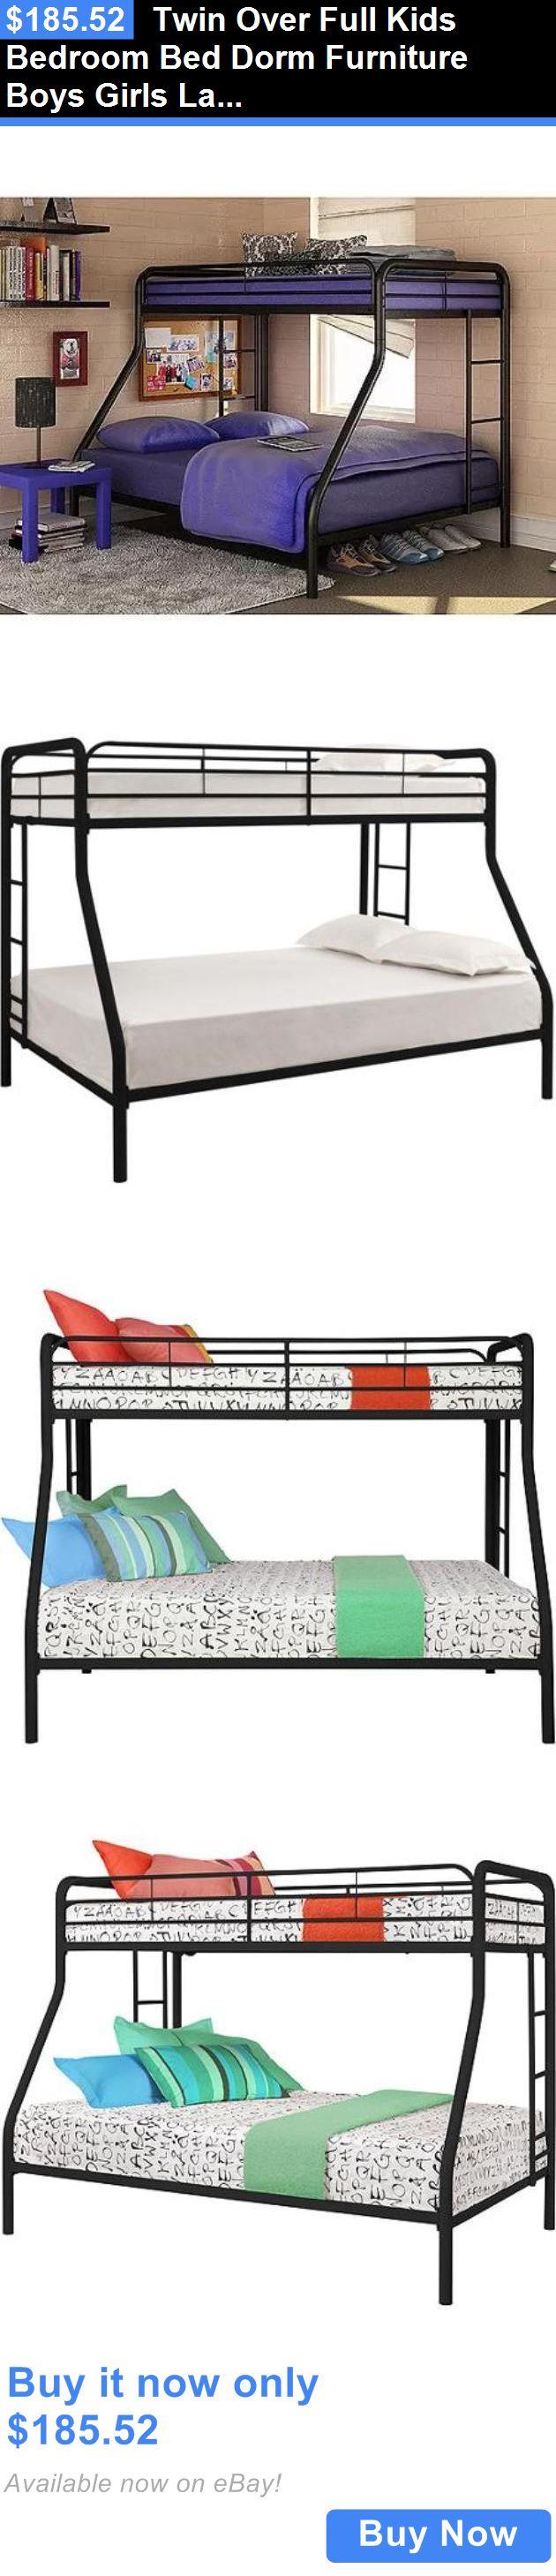 Kids Furniture: Twin Over Full Kids Bedroom Bed Dorm Furniture Boys Girls Ladder Metal Bunk Beds BUY IT NOW ONLY: $185.52